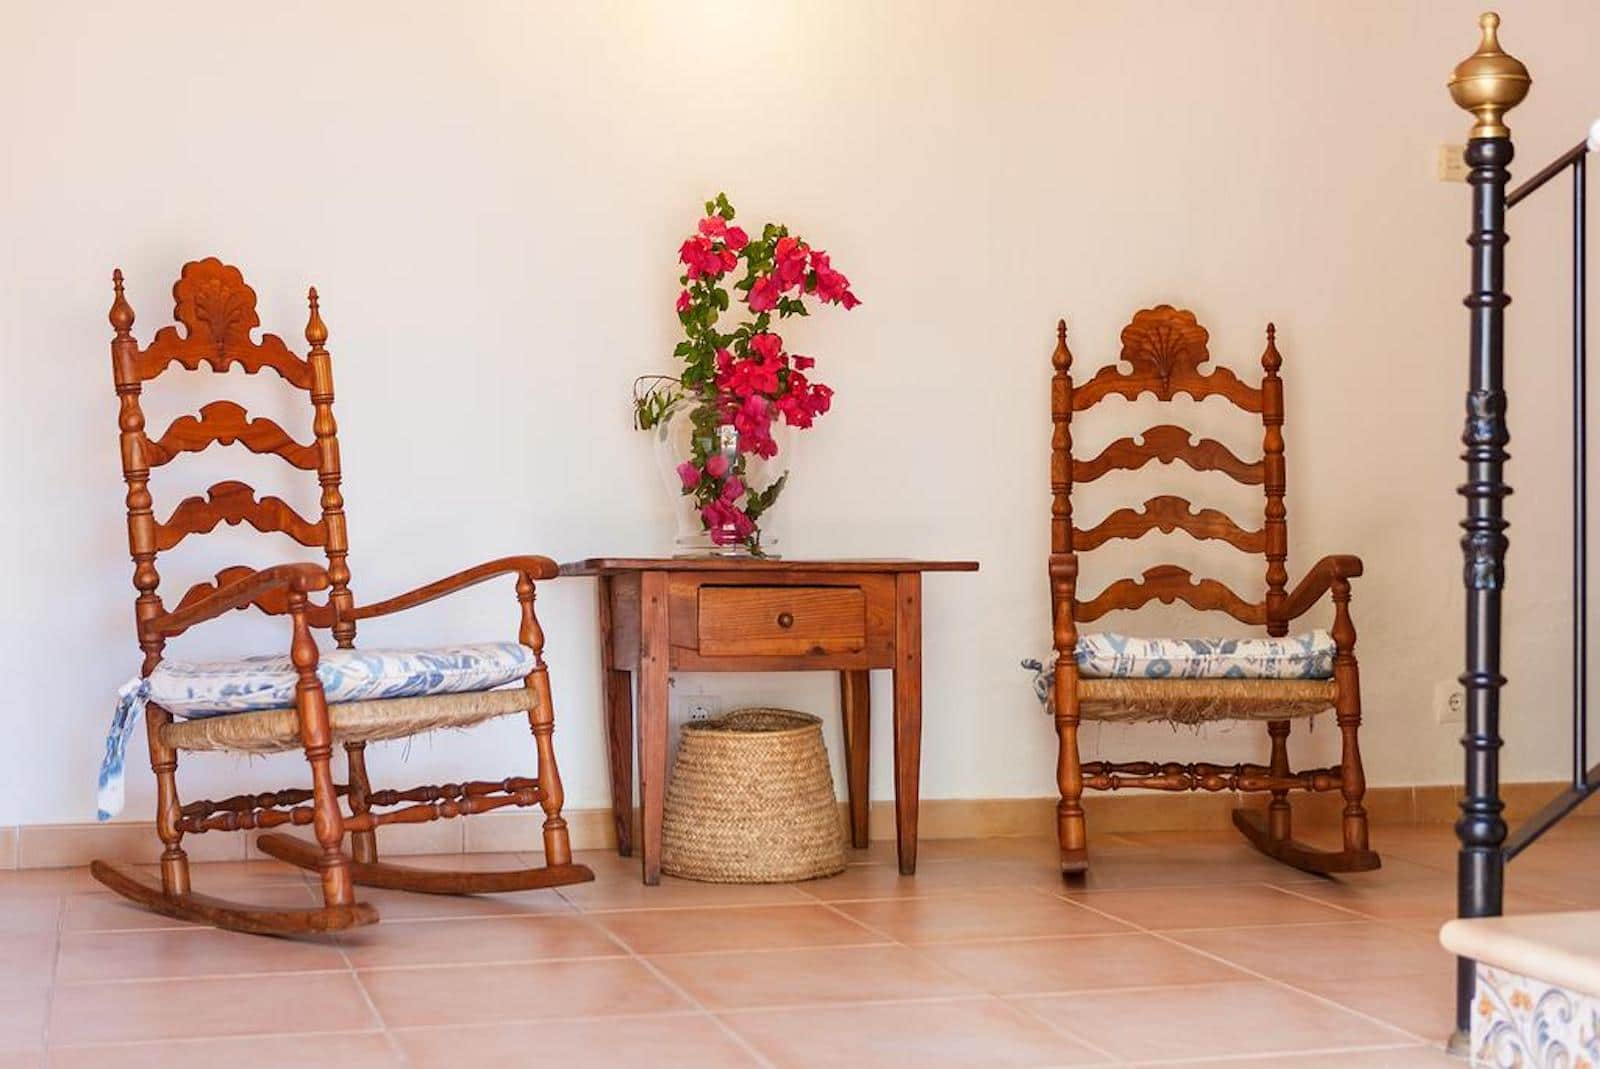 ISLA-Travel-Finca-Hotel-Mallorca-Relax